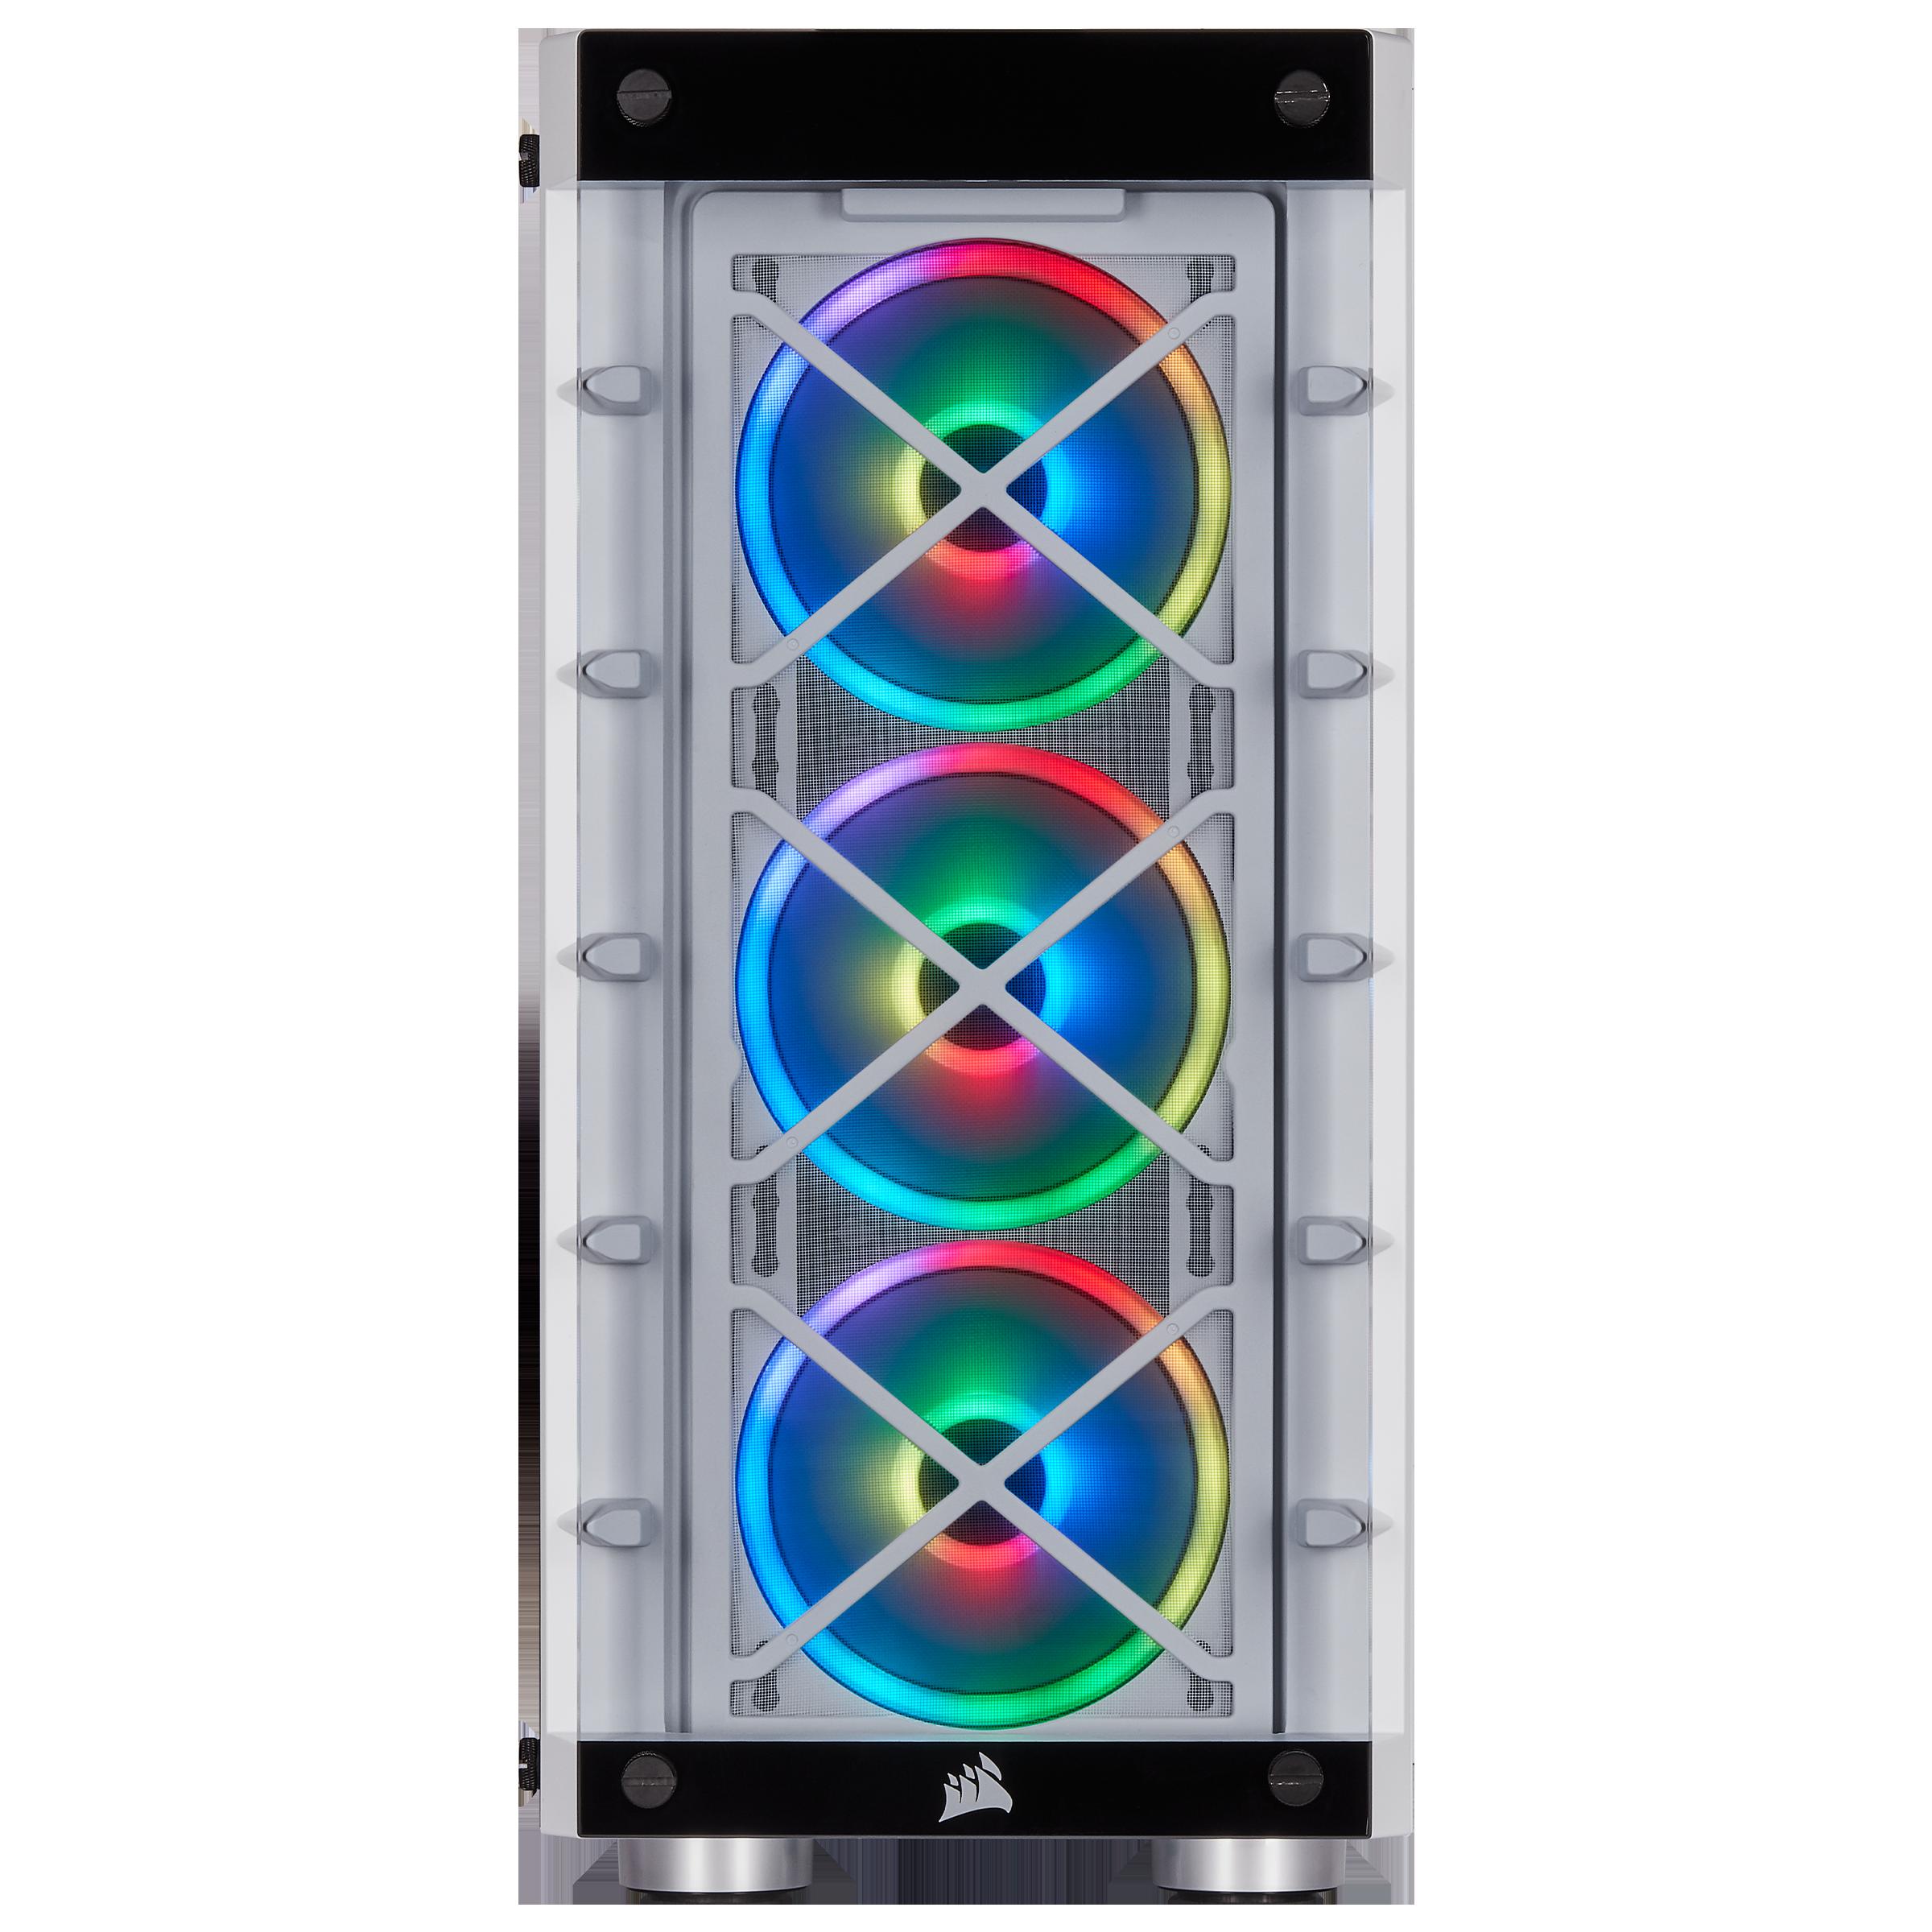 Corsair iCUE 465X RGB Smart Case